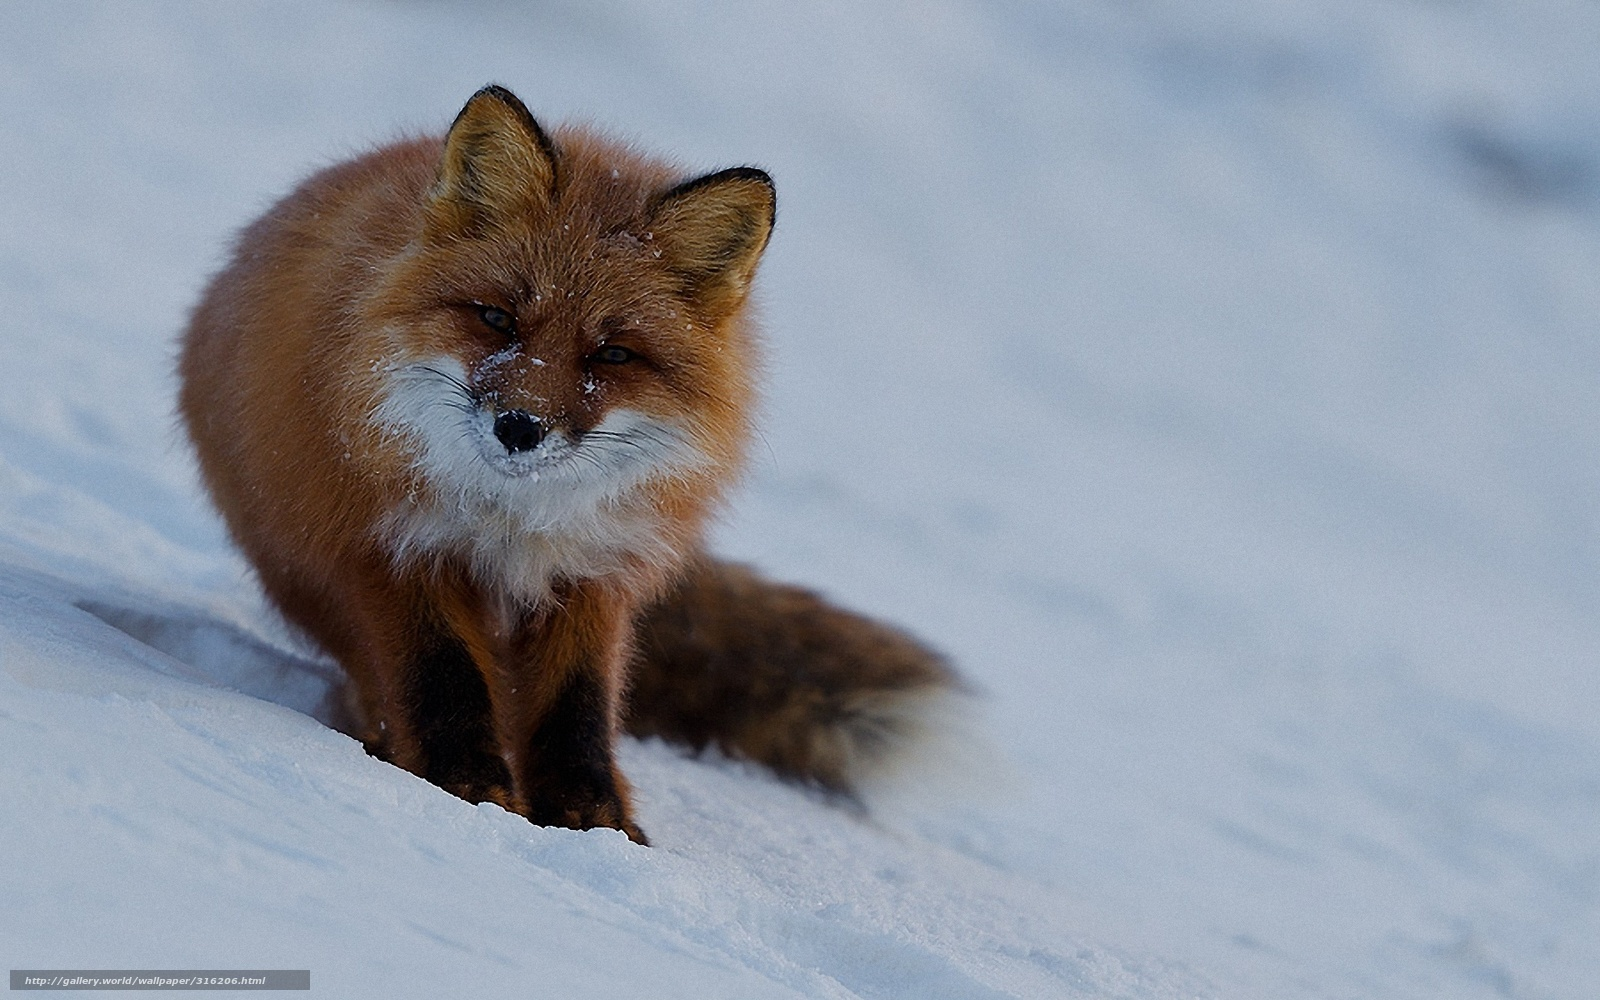 Cute fox wallpaper wallpapersafari - Fox desktop background ...